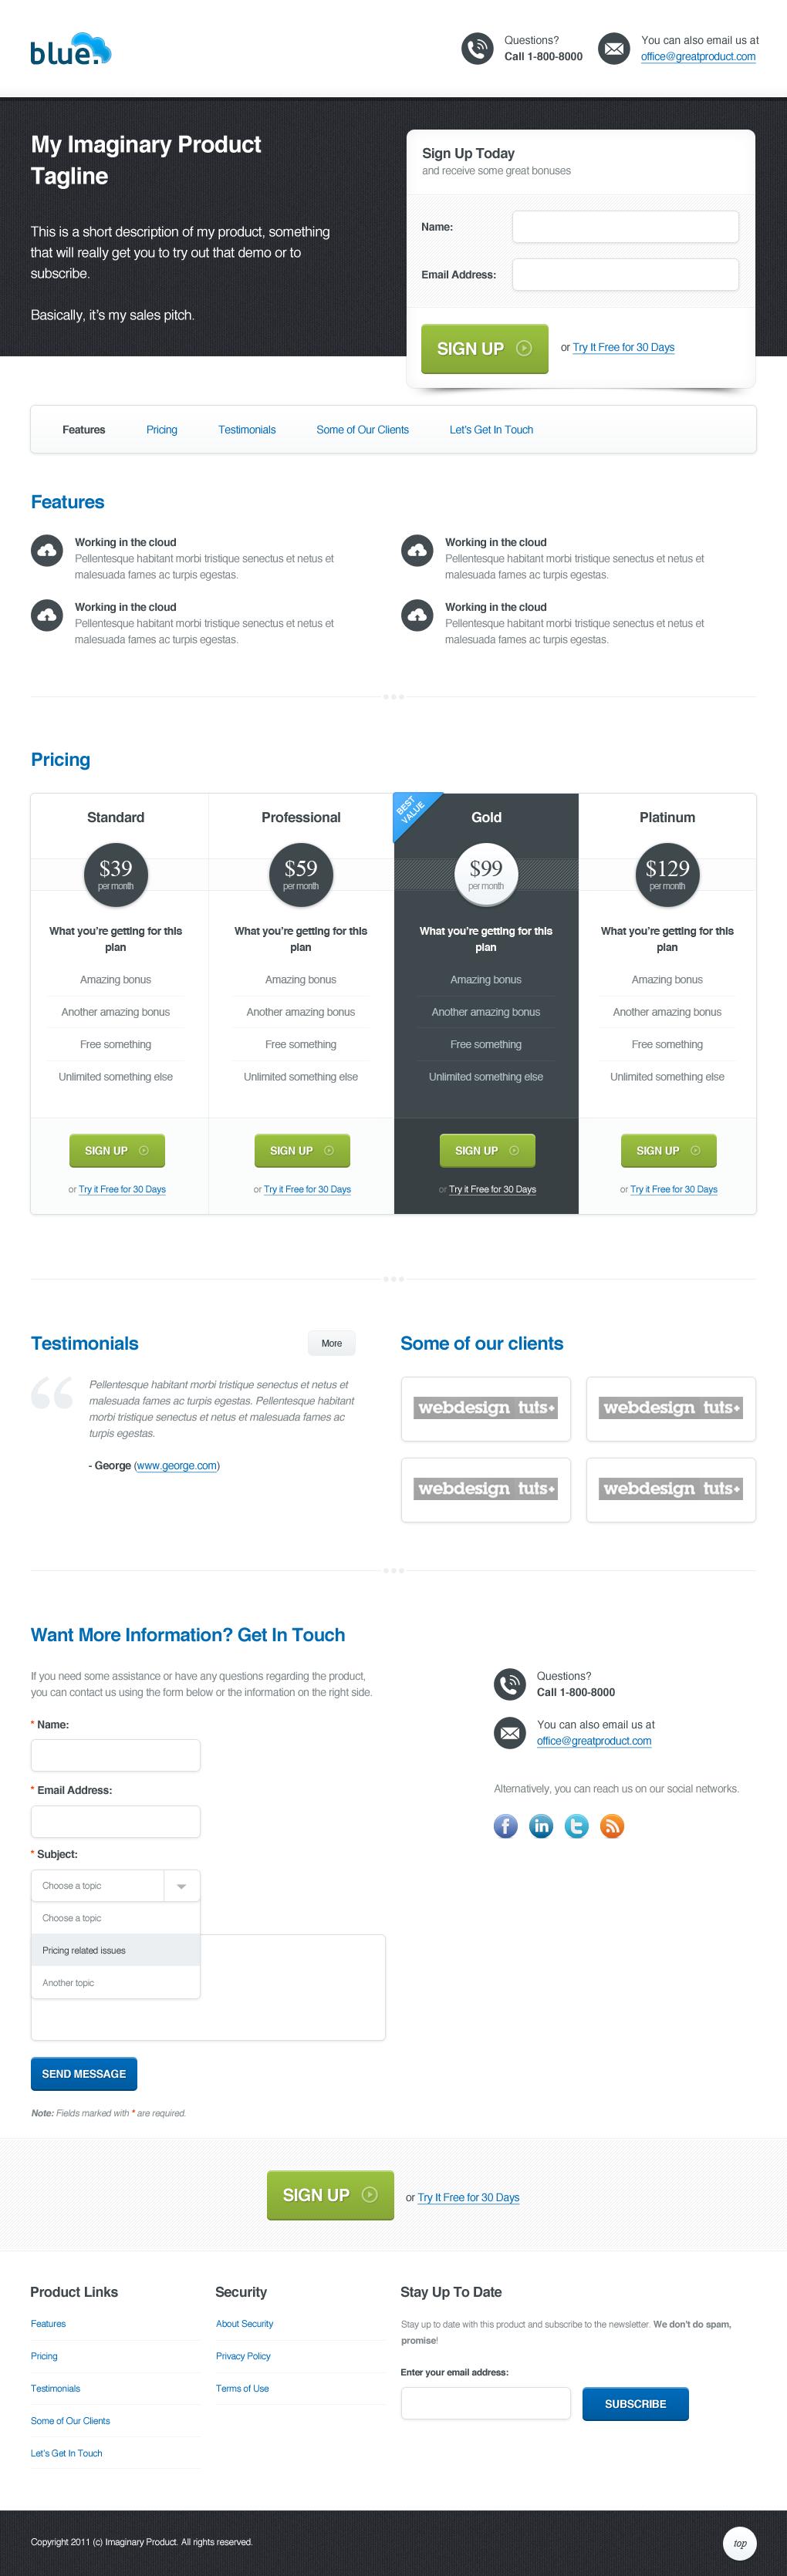 Web design workshop 8 web app landing page - Web application home page design ...